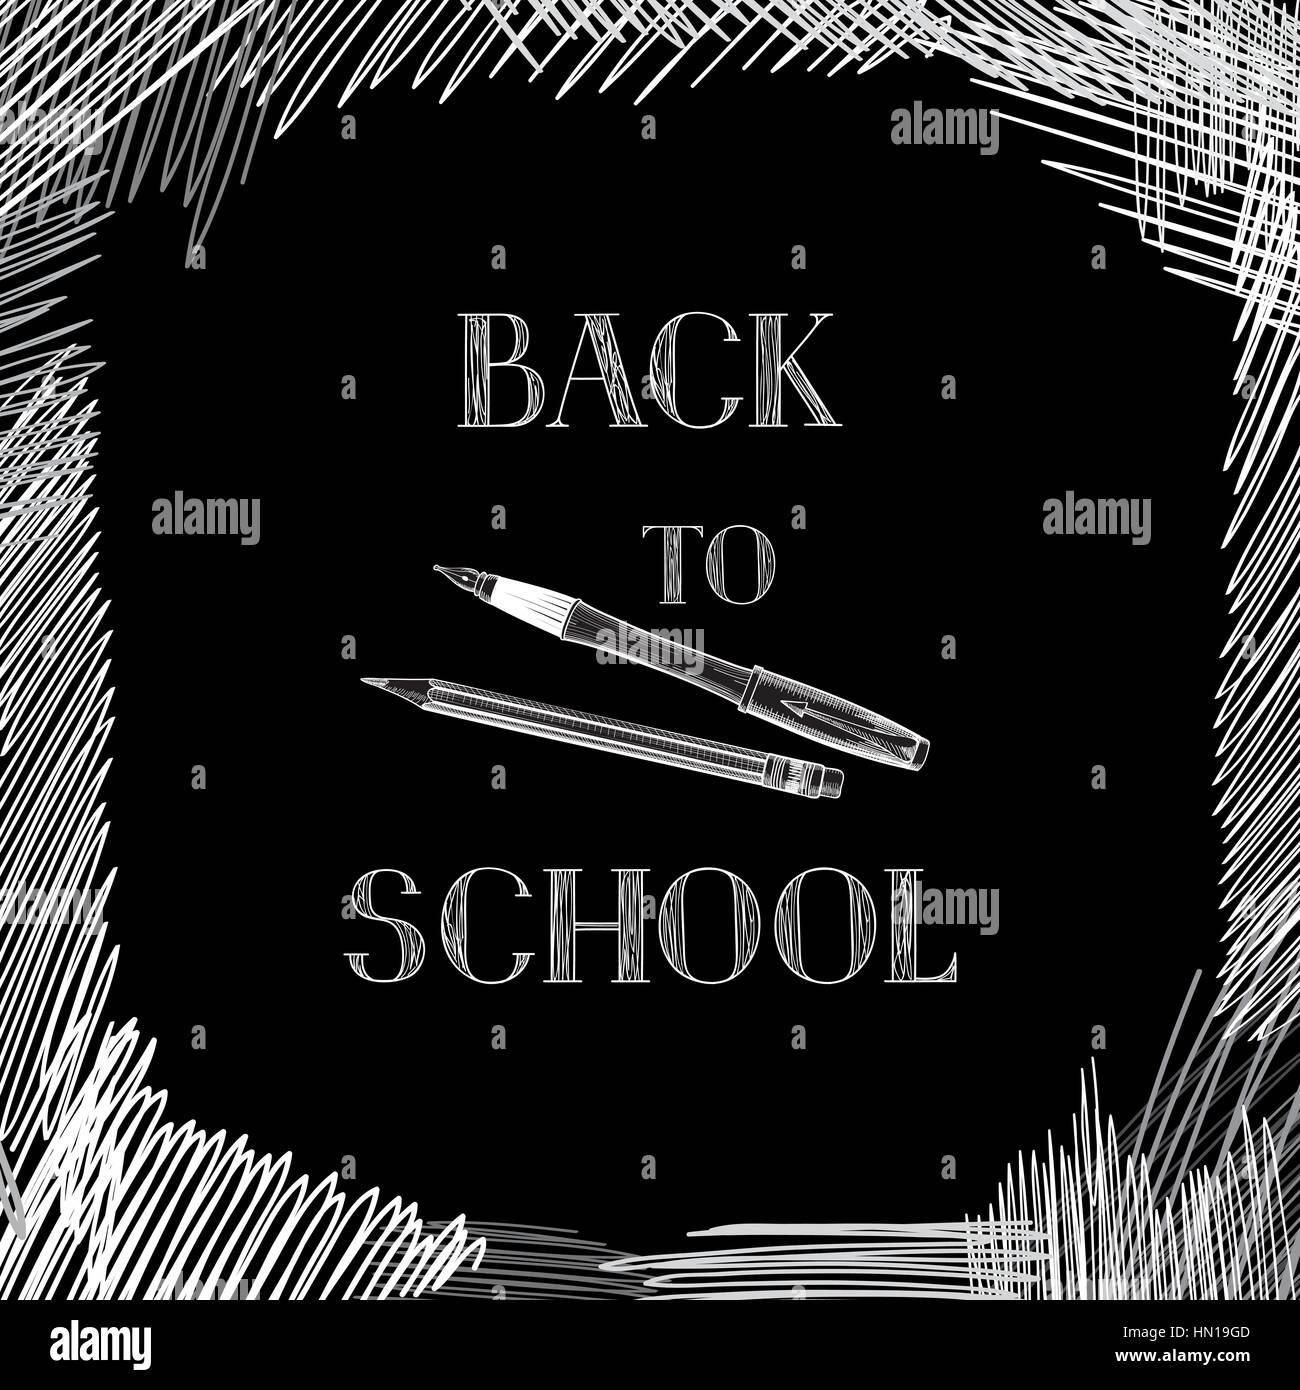 Back to school. Chalkboard background. Hand drawn message written over blackboard. Vector. - Stock Vector